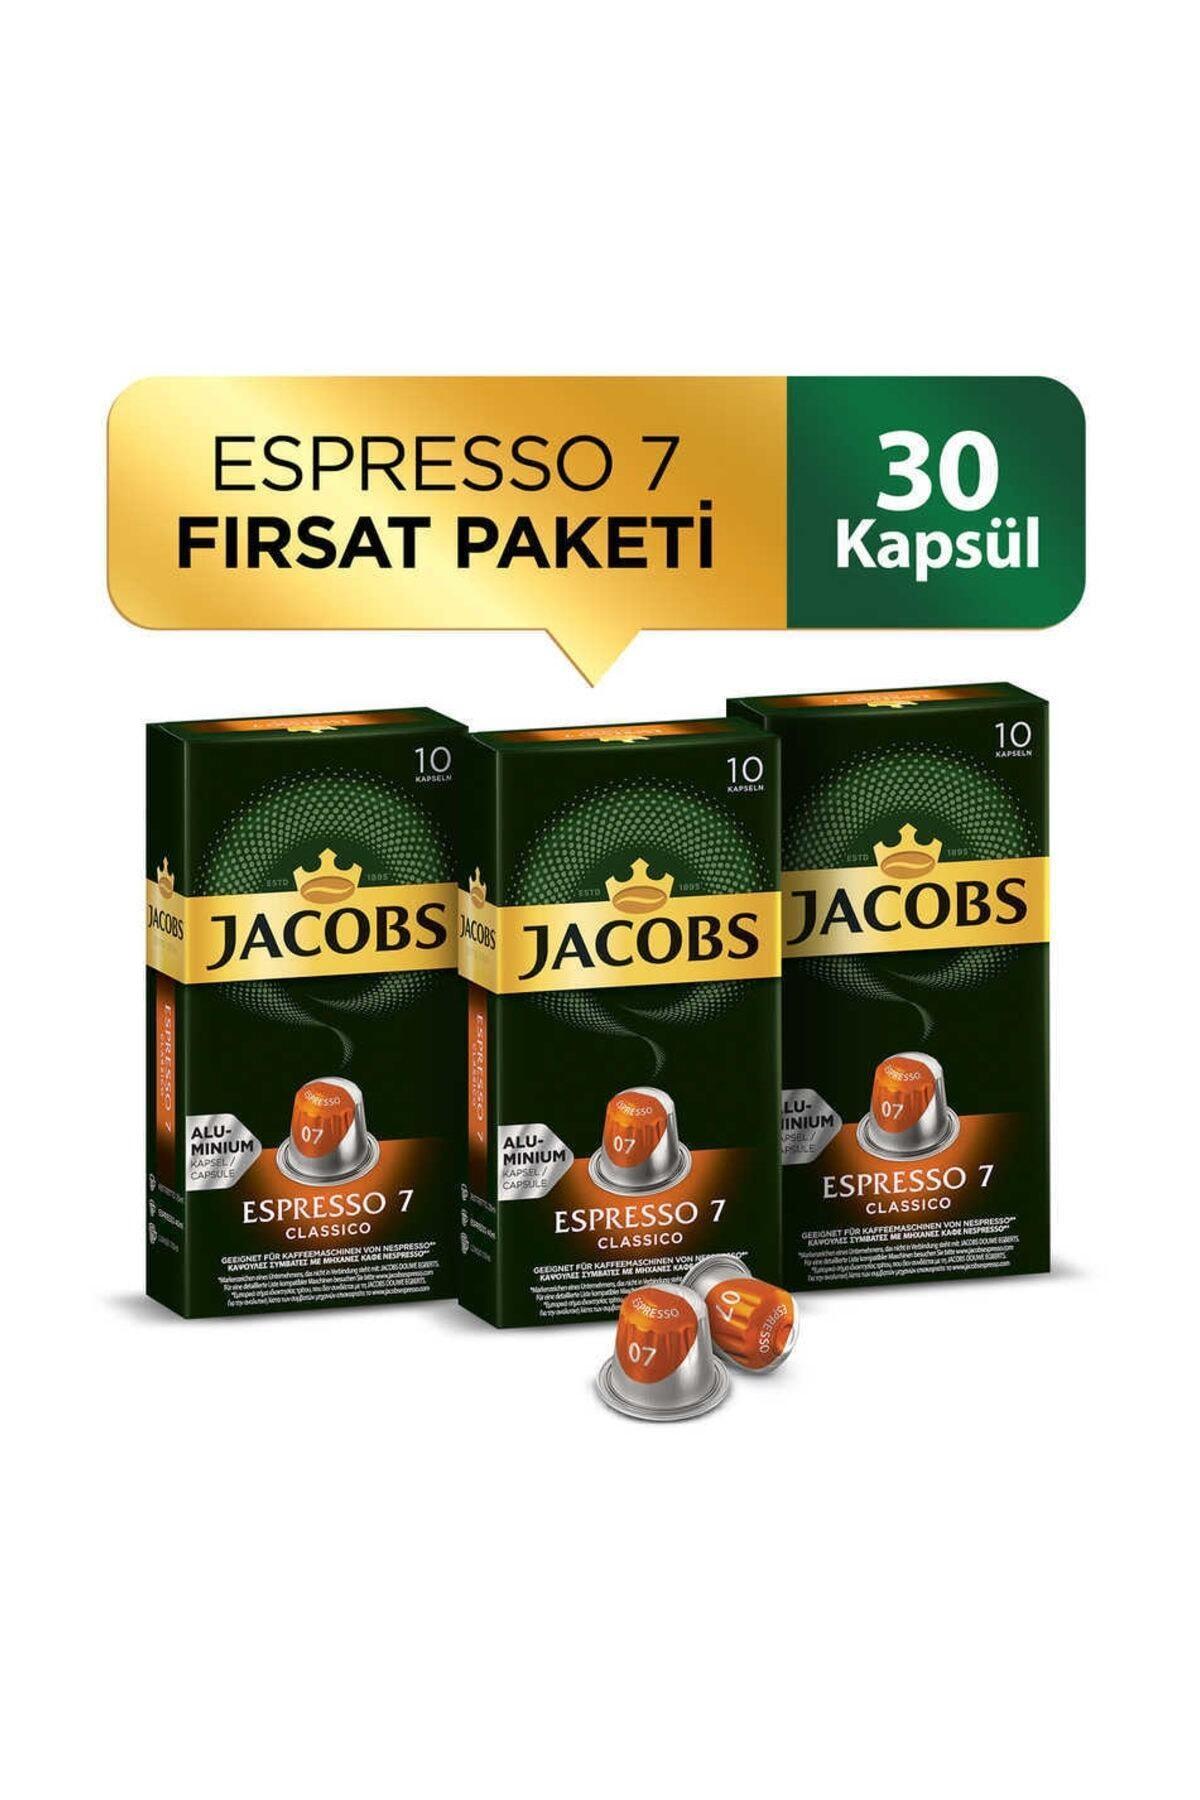 Espresso 7 Classico Kapsül Kahve 30 Kapsül